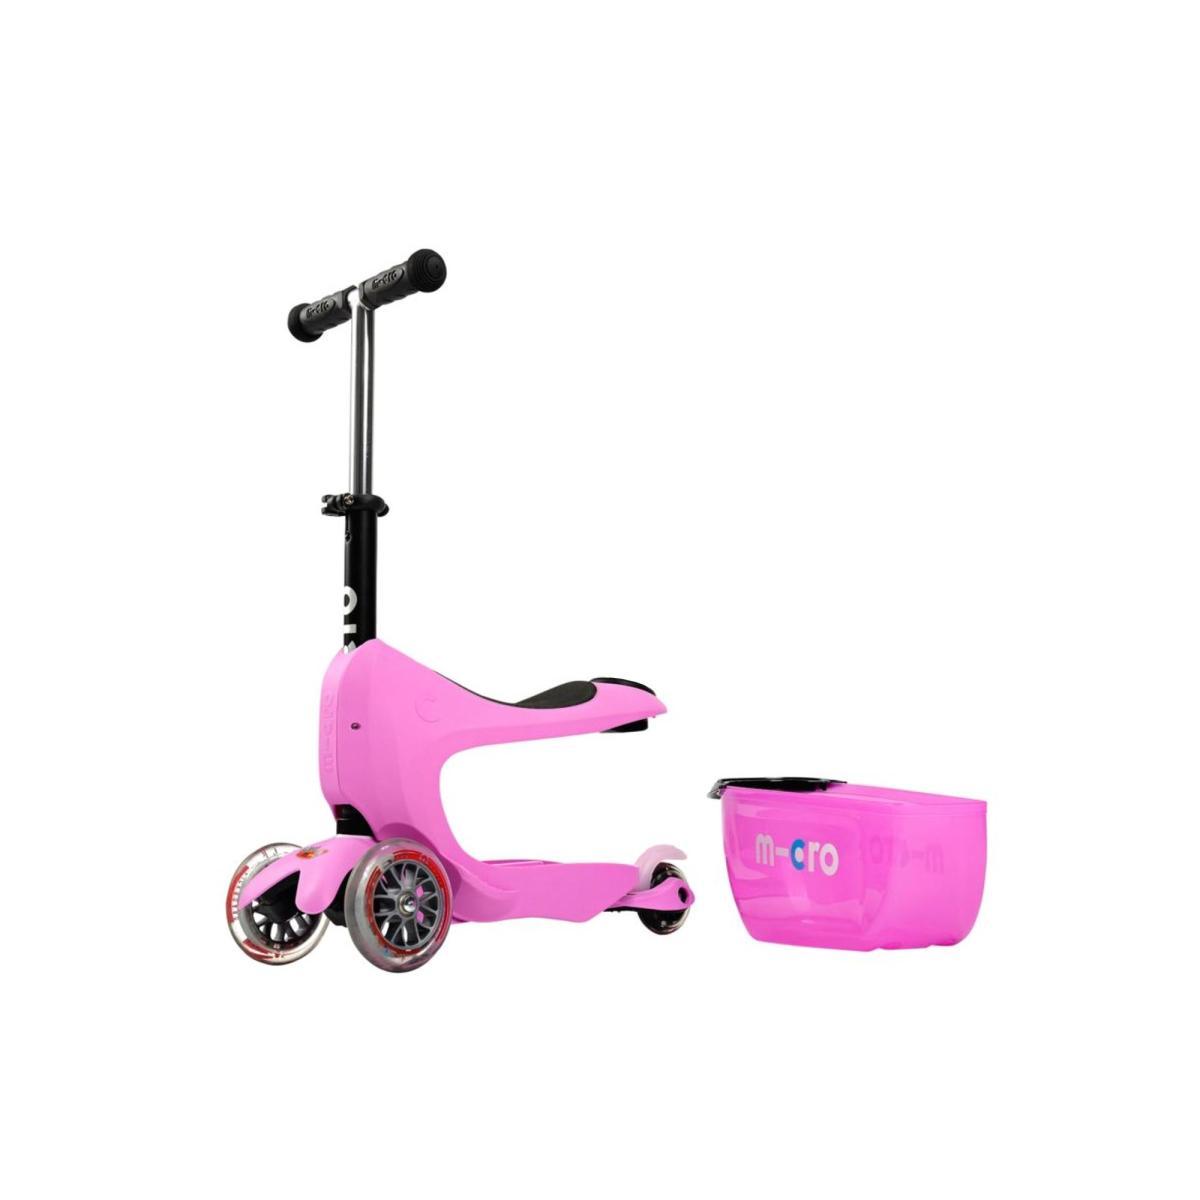 Micro Mini2go Deluxe Pink